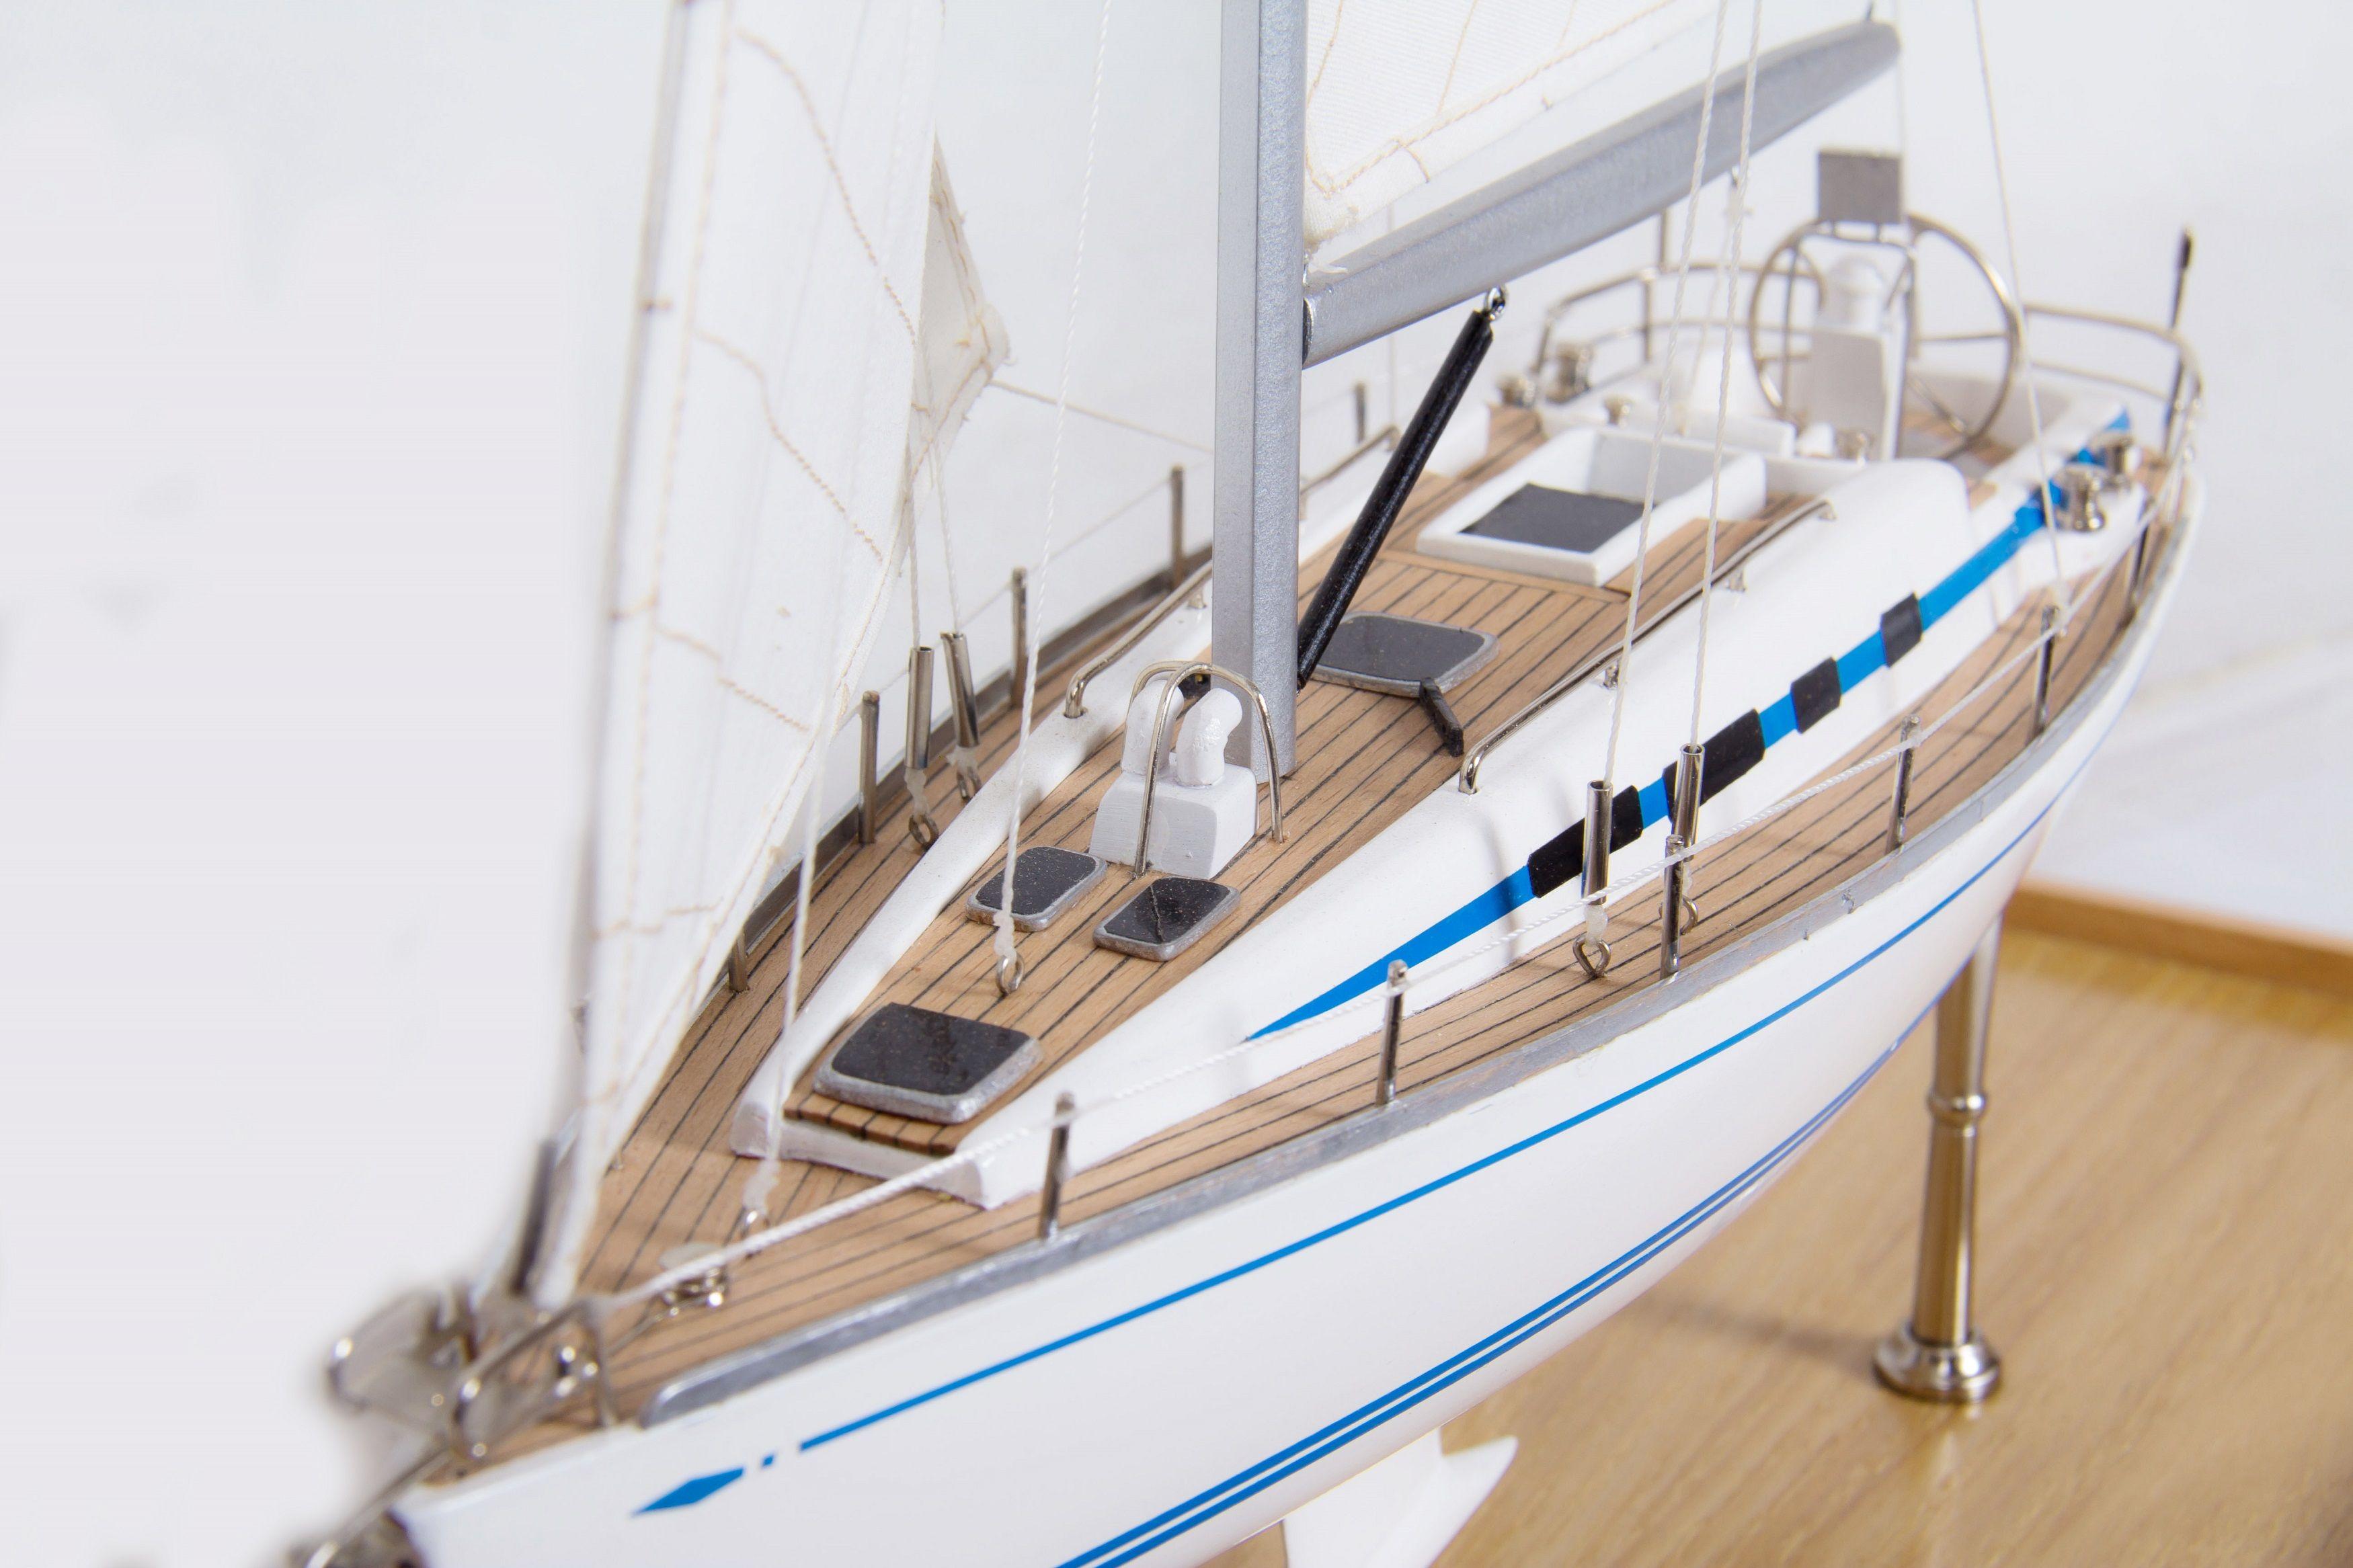 1775-9943-Bella-Nove-Sailing-Yacht-model